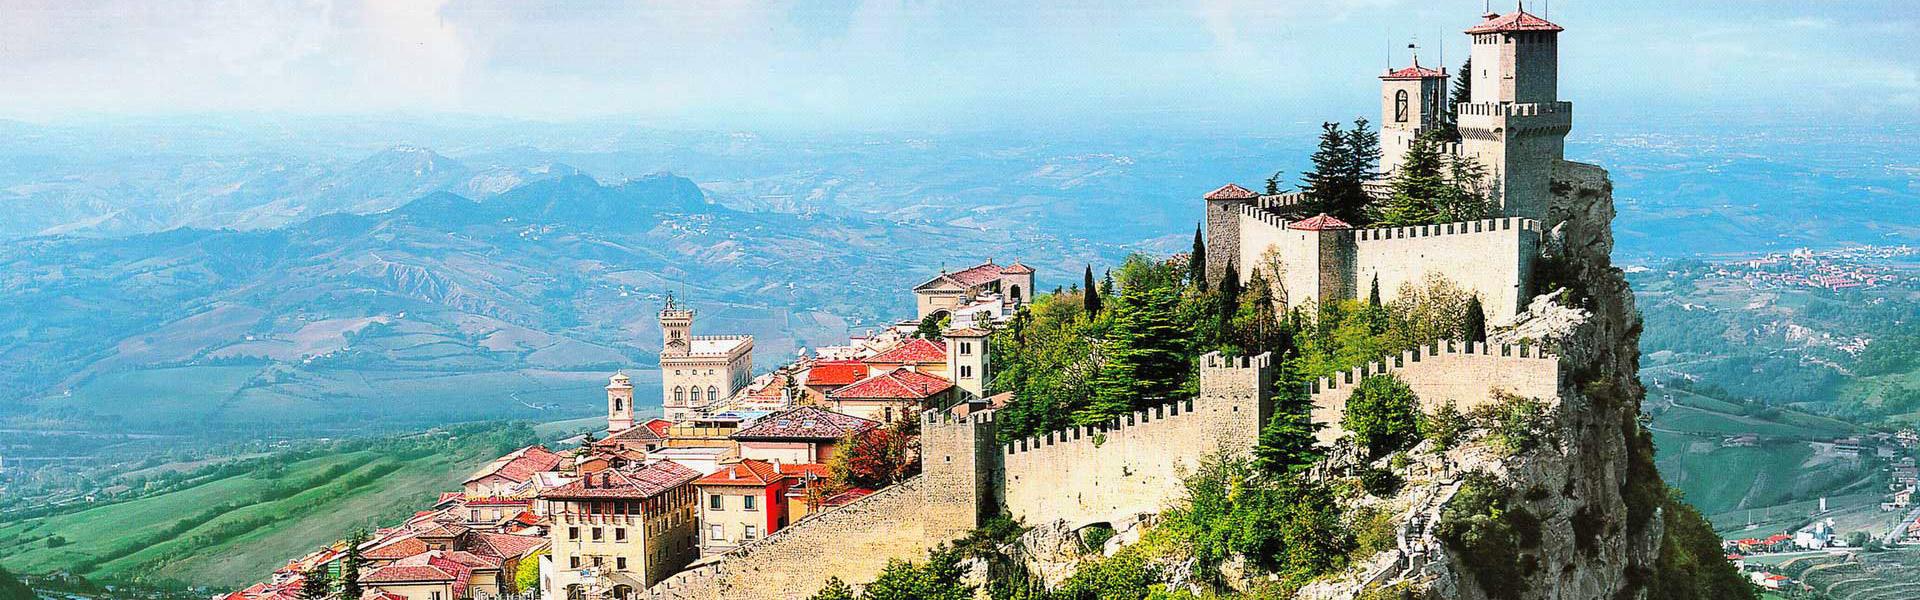 Hotel Cevoli dintorni San Marino